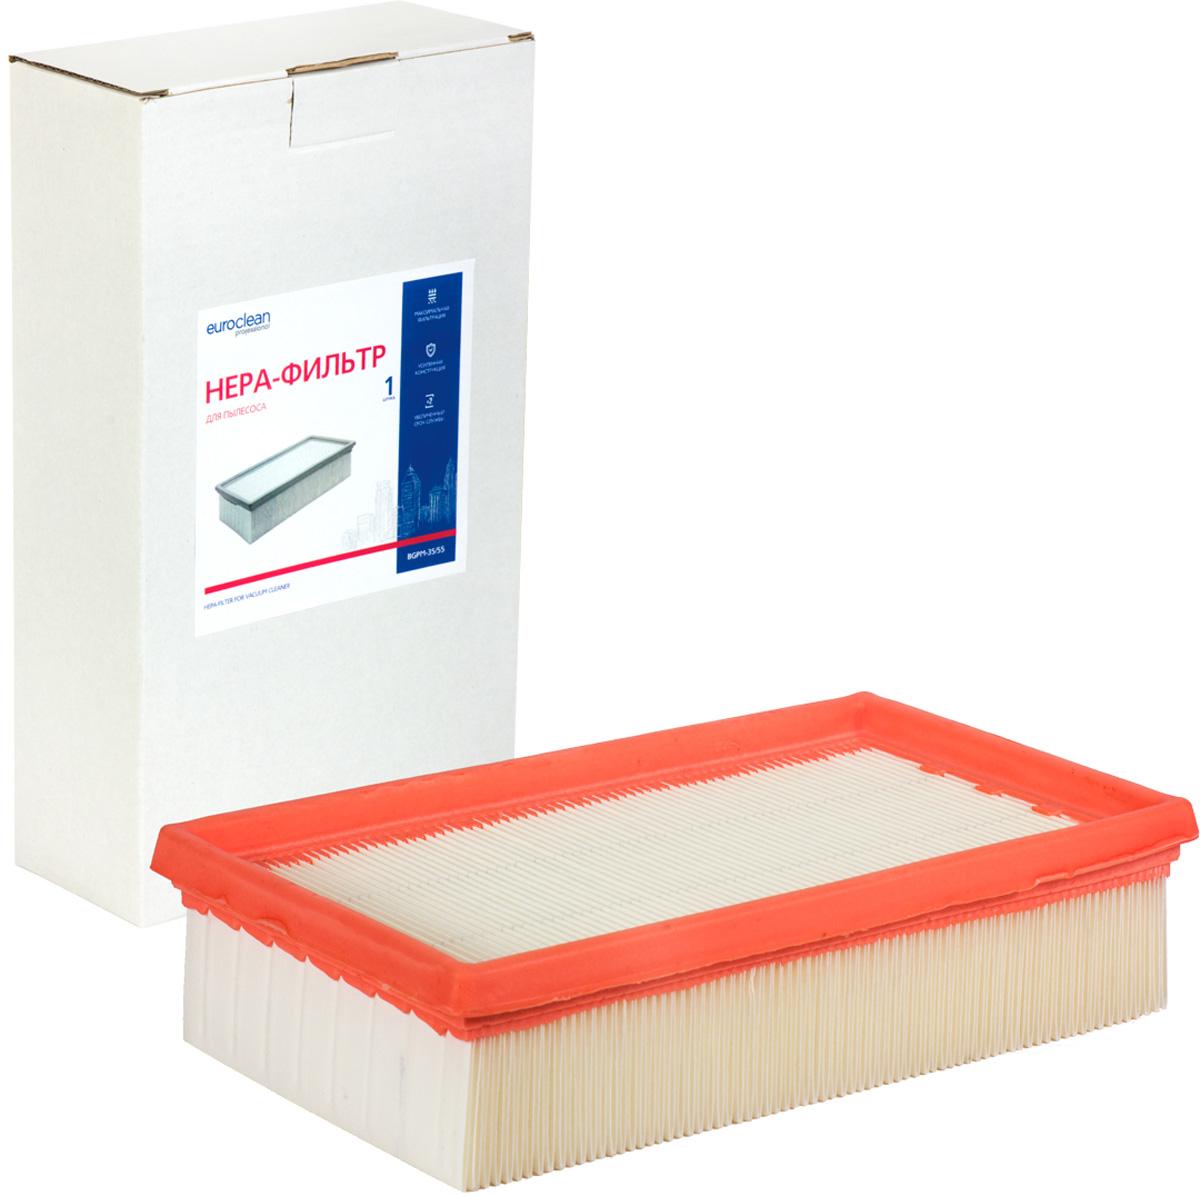 Euroclean BGPM-35/55 фильтр складчатый для пылесоса BOSCH (аналог 2 607 432 033) цена